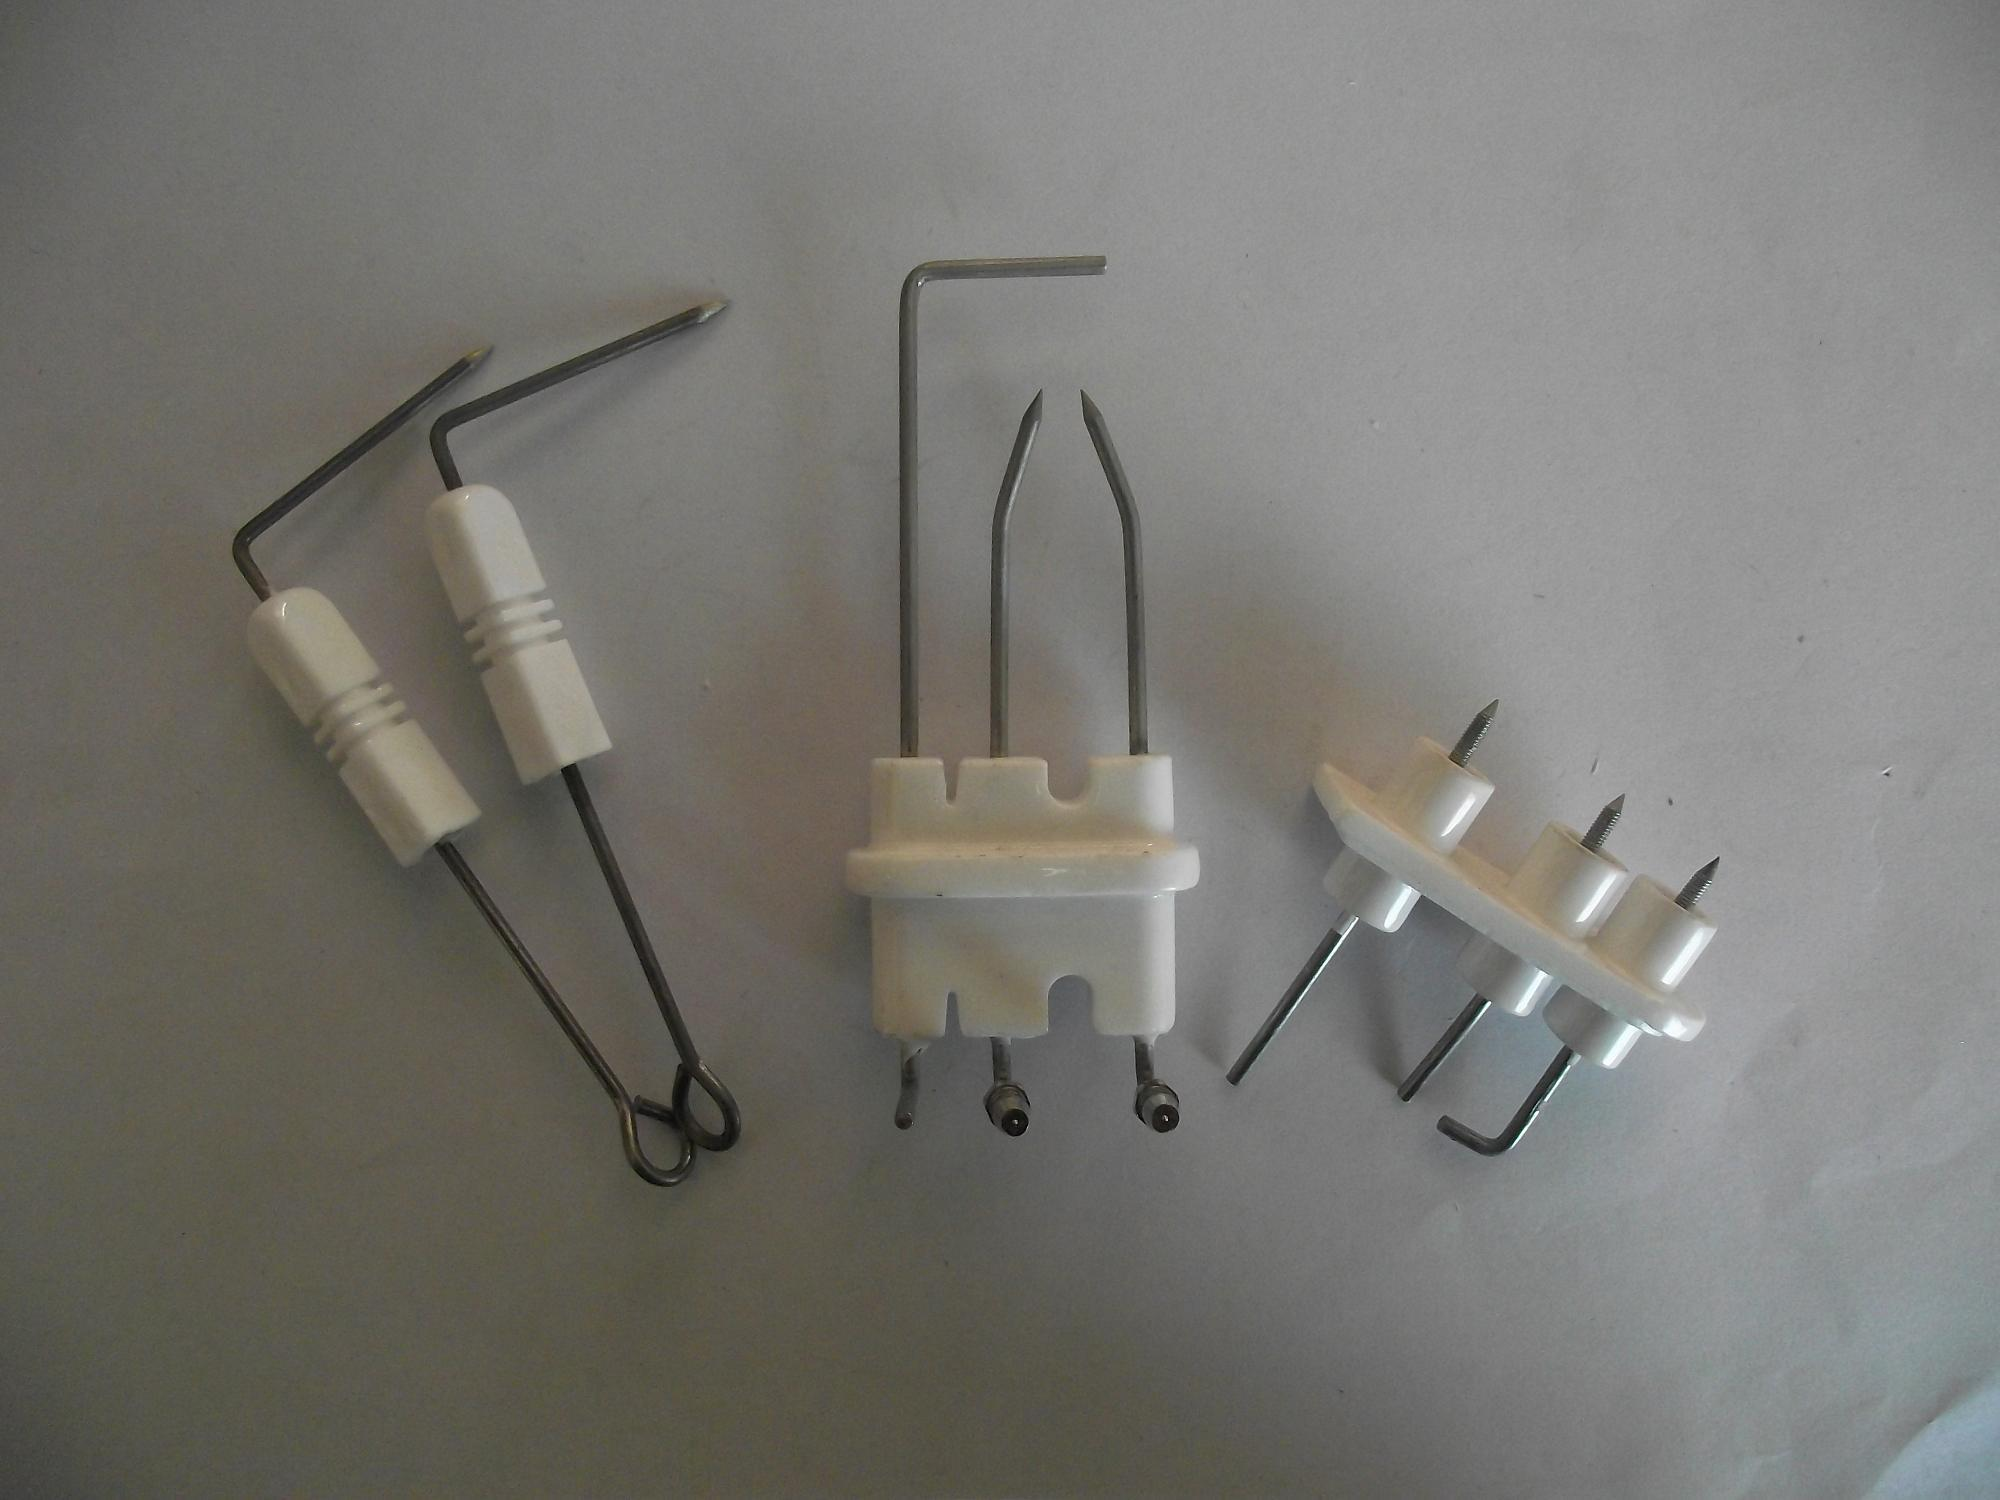 ceramics ignition needle 2